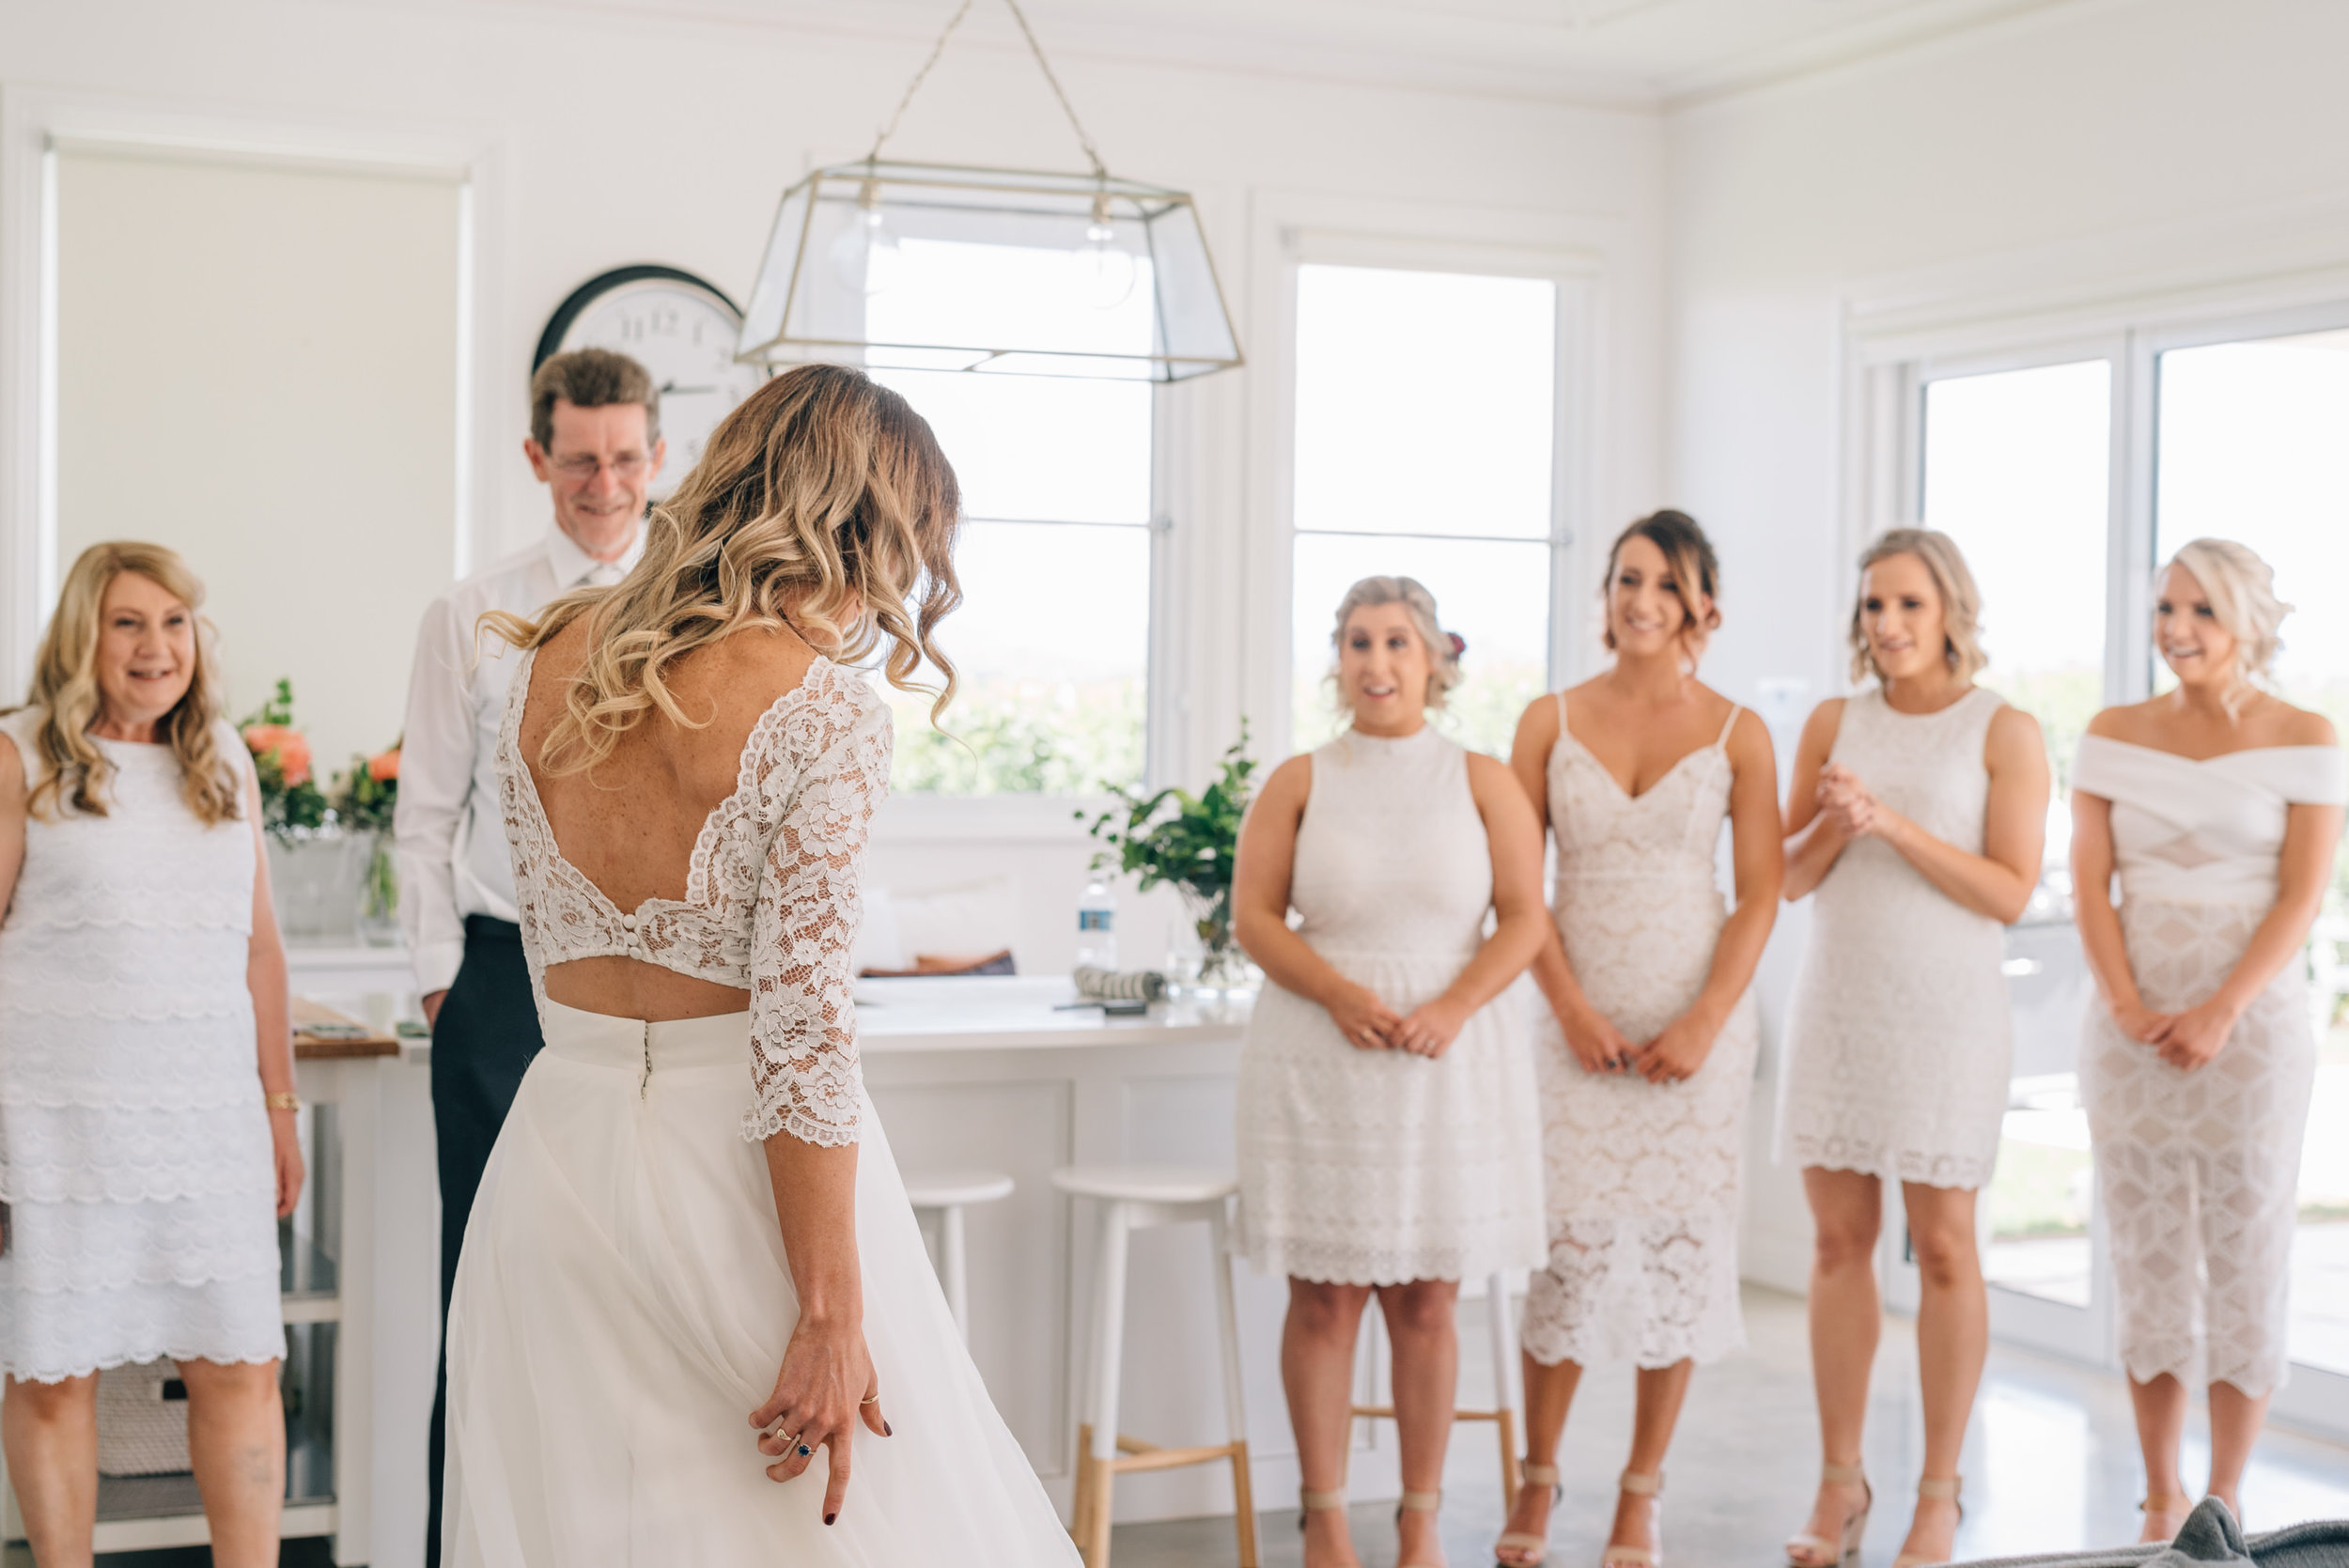 Jenna_Matt_Wedding-30.jpg